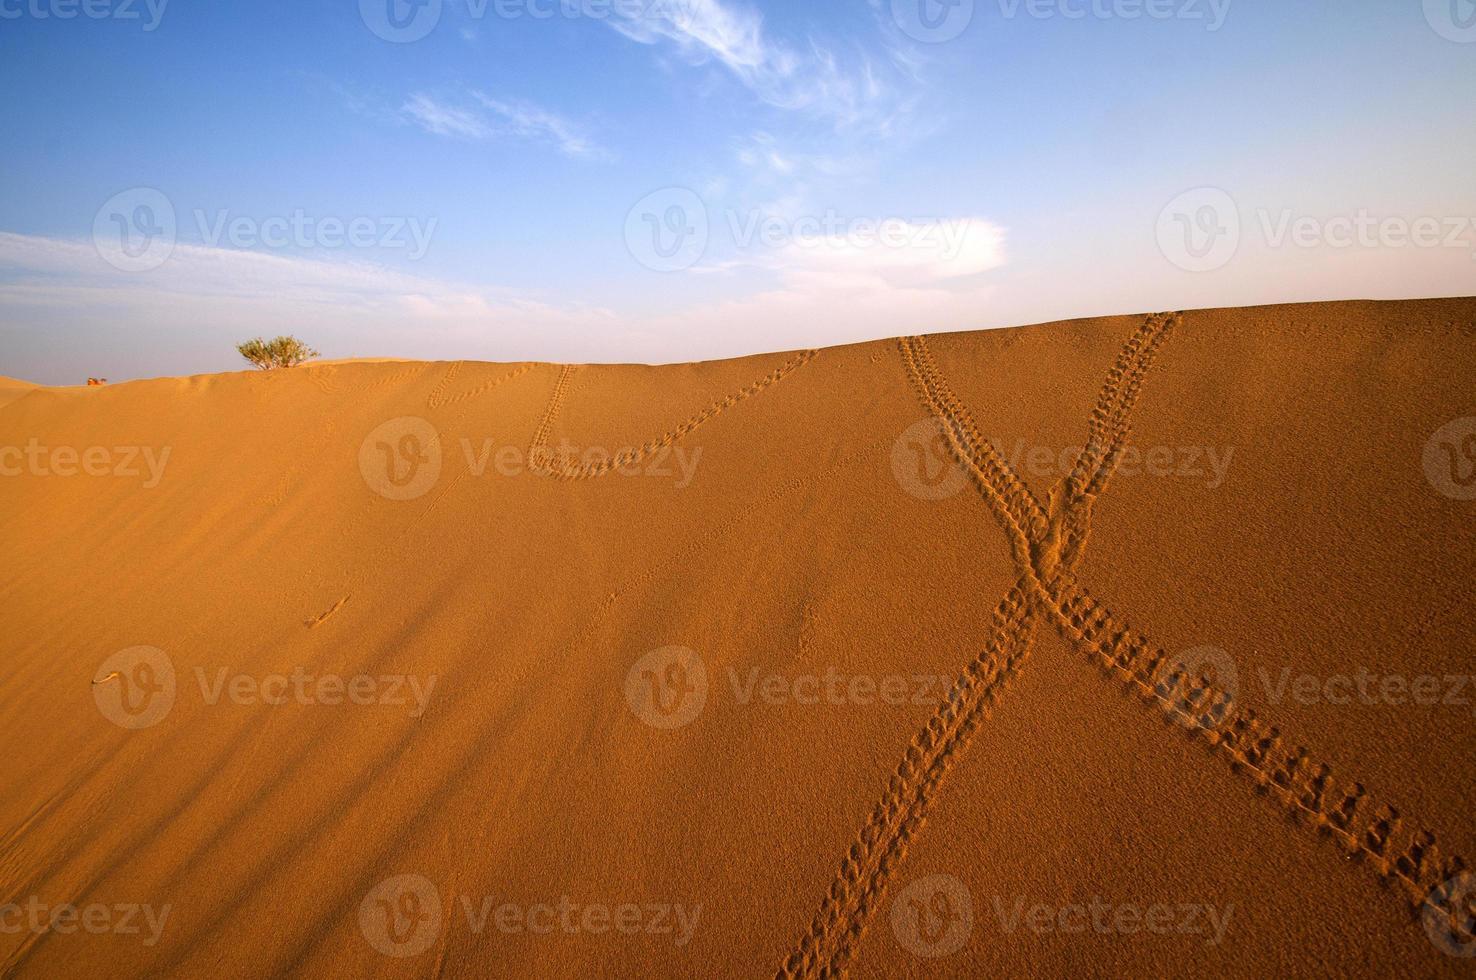 woestijn, zandduinen bij zonsondergang foto